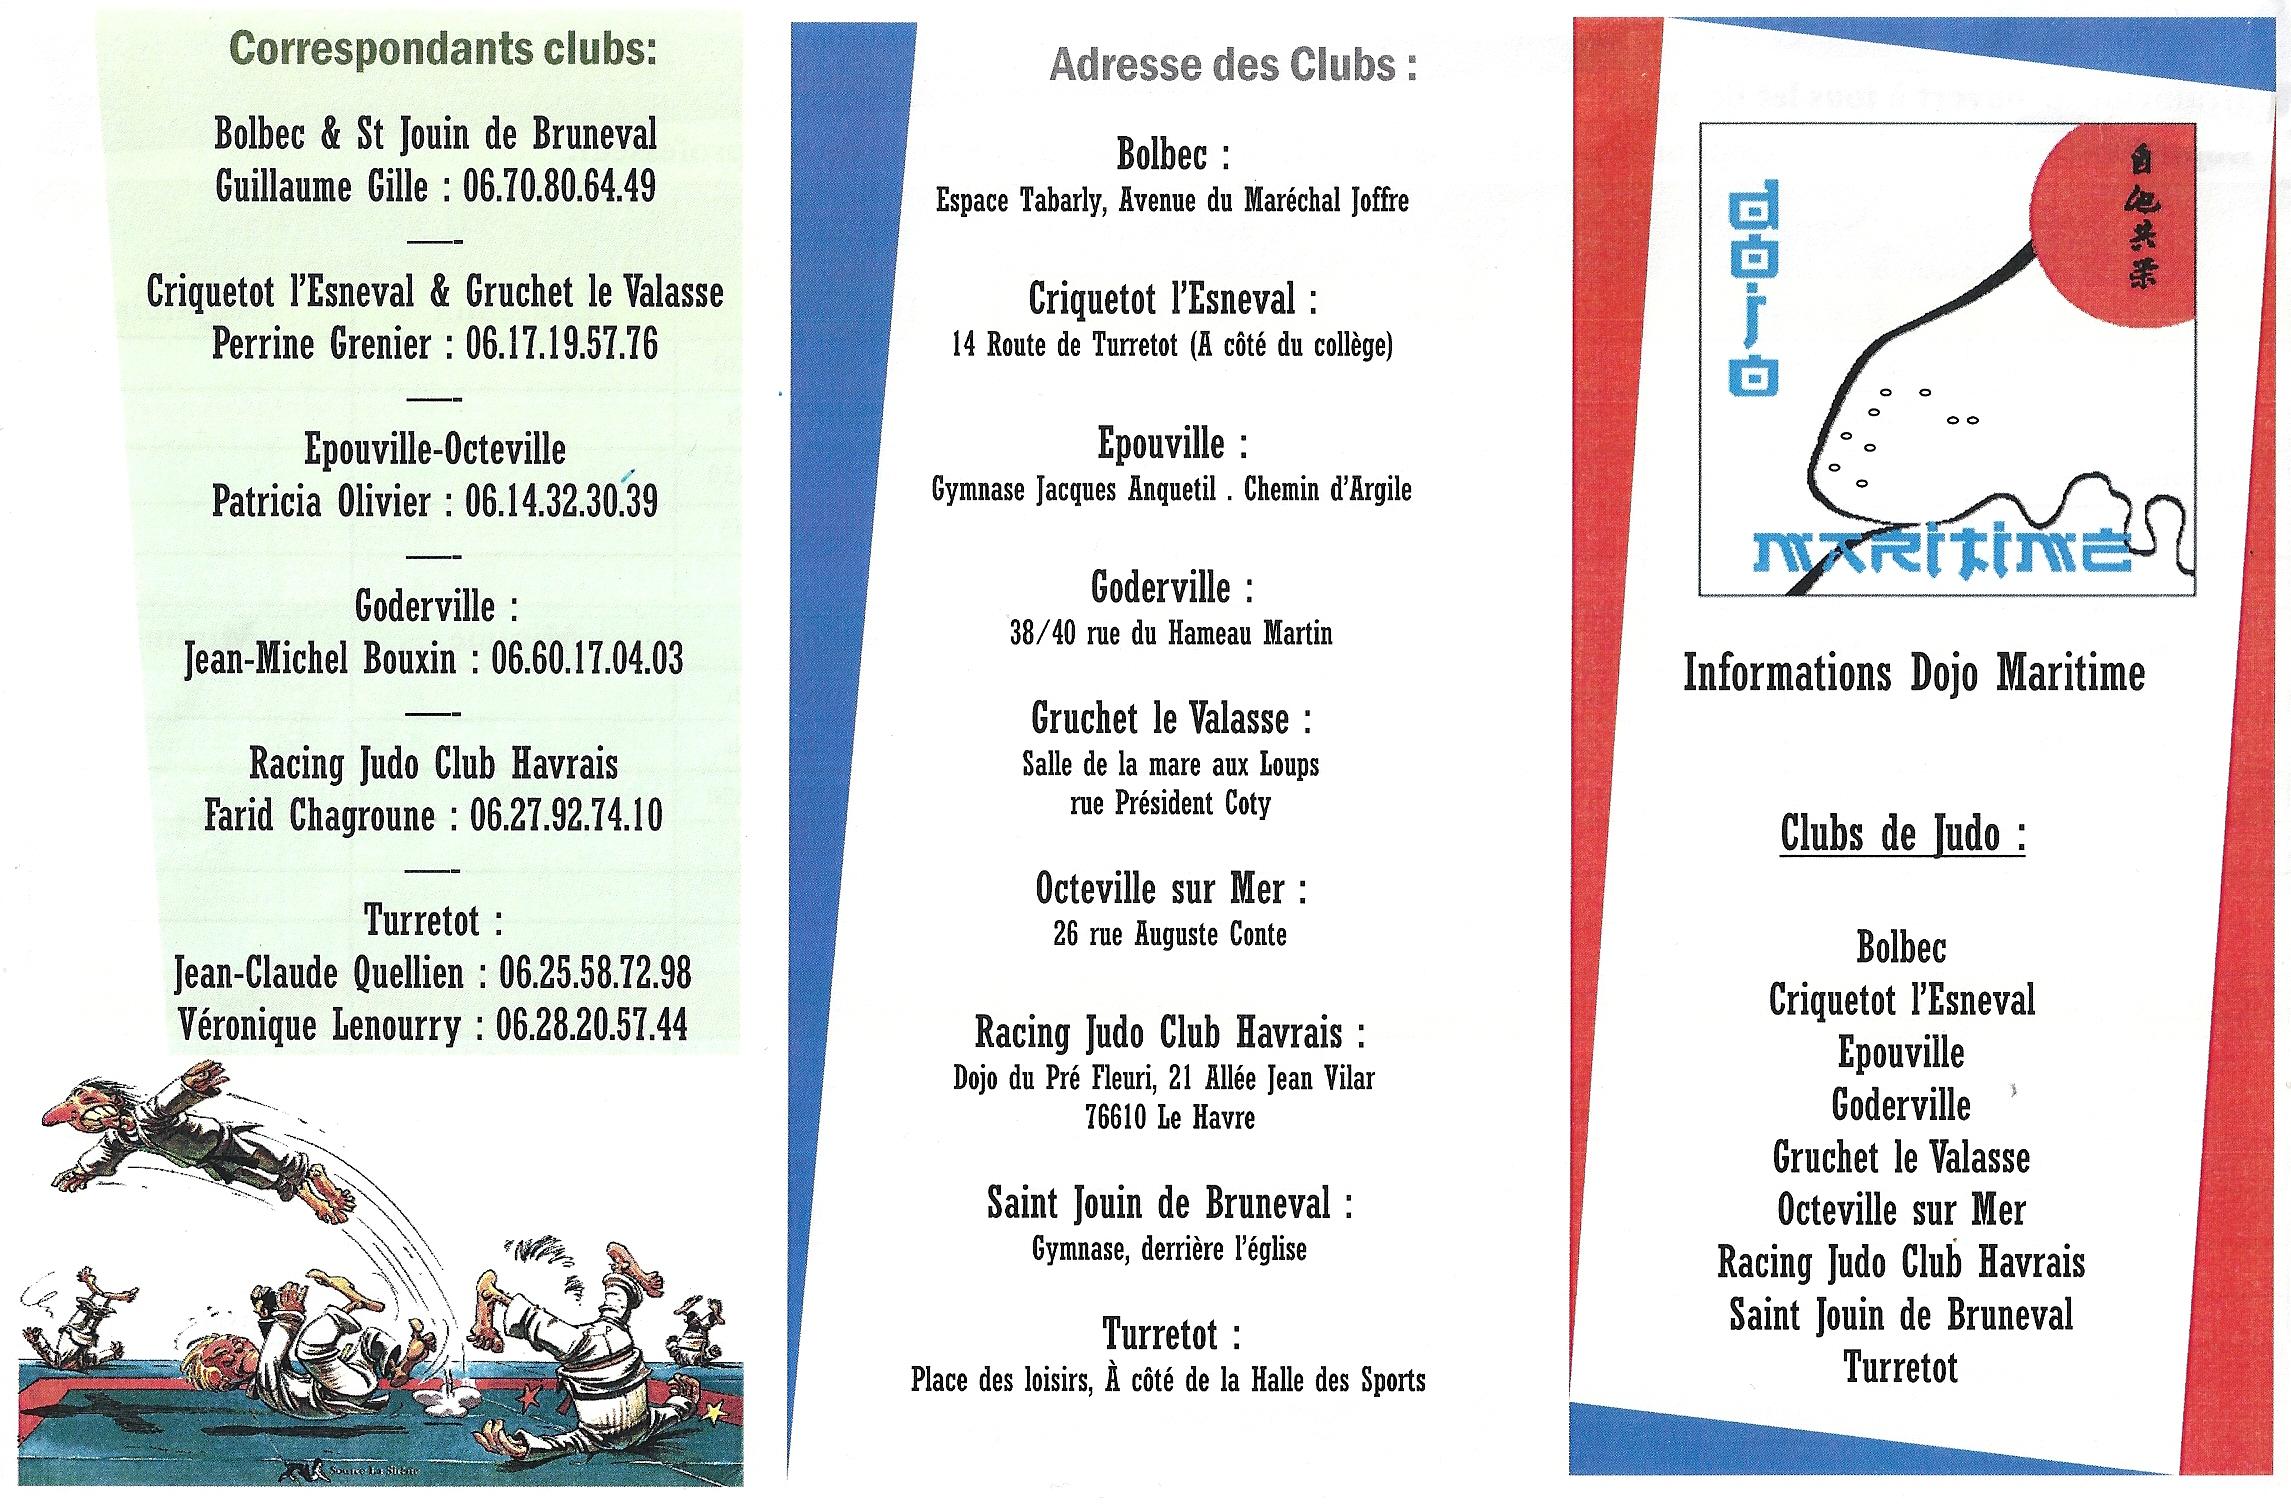 informations Dojo Maritime